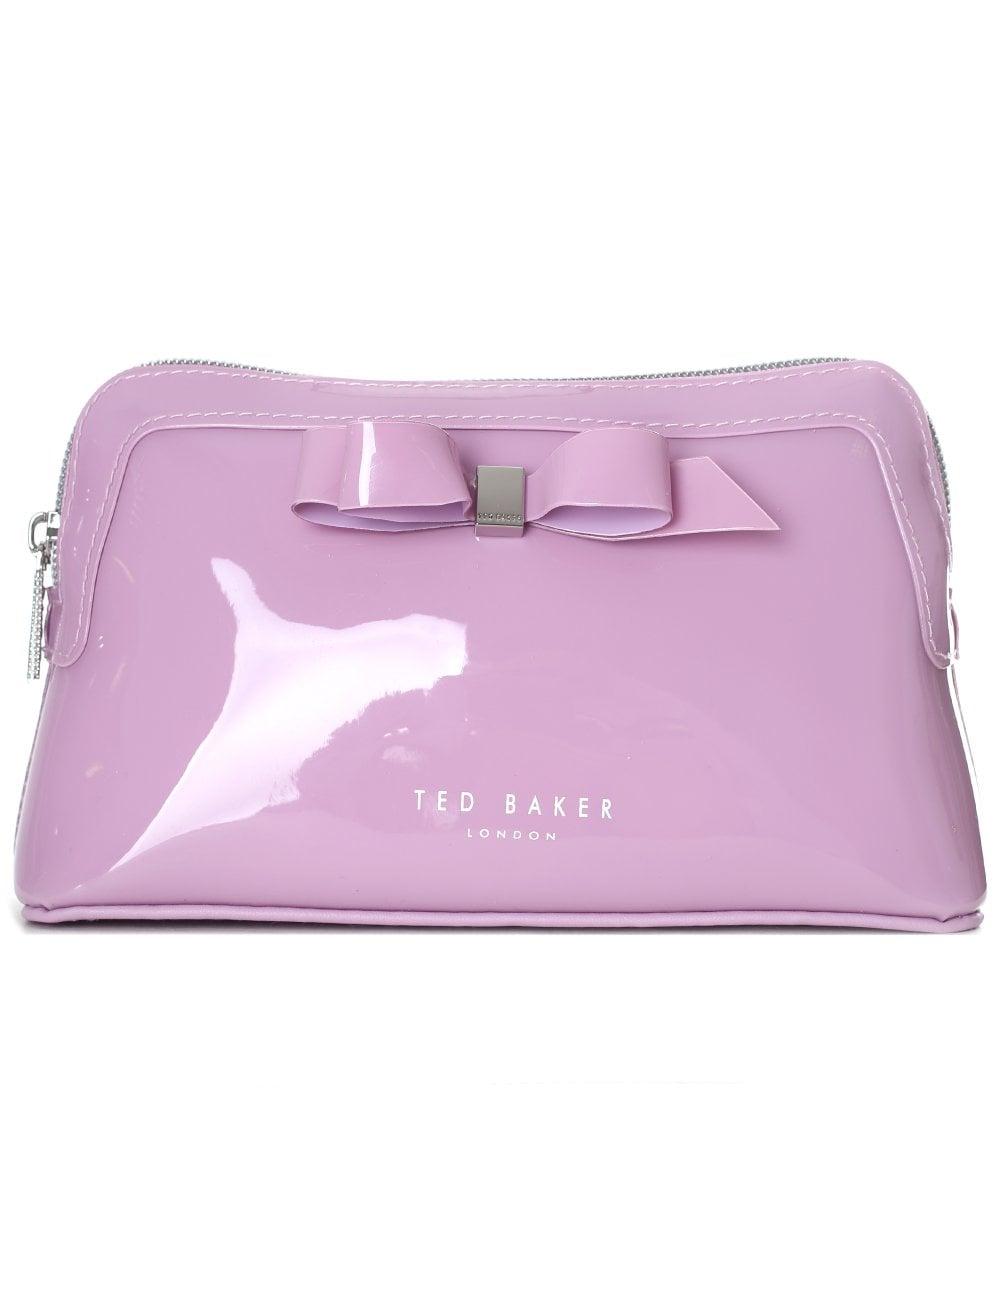 7c5e206b8c Ted Baker Women's Cahira Bow Makeup Bag